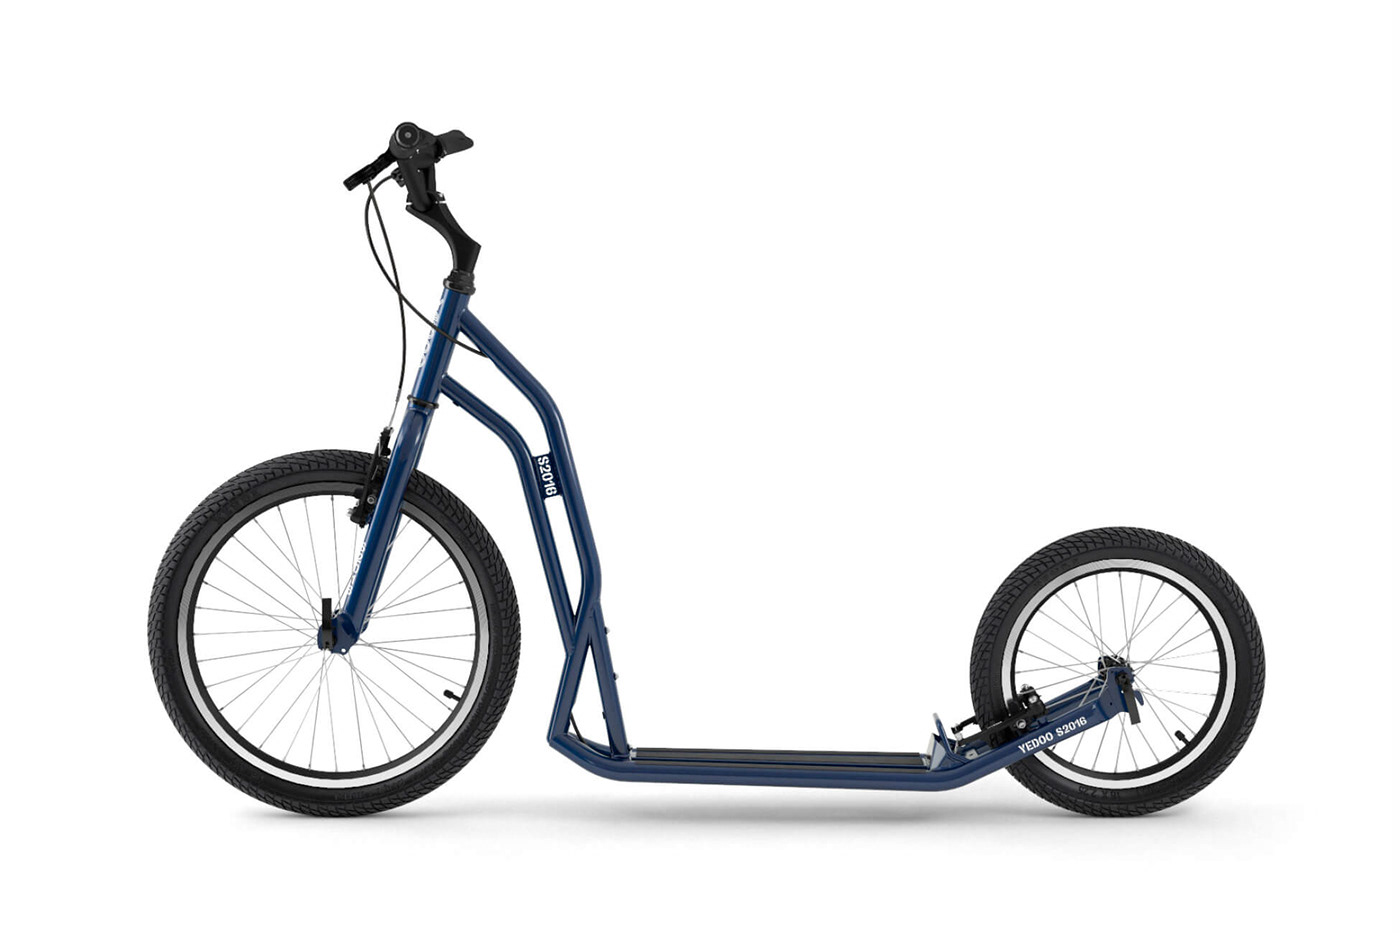 Bike Collection najbrt prague Scooter steel studio najbrt yedoo